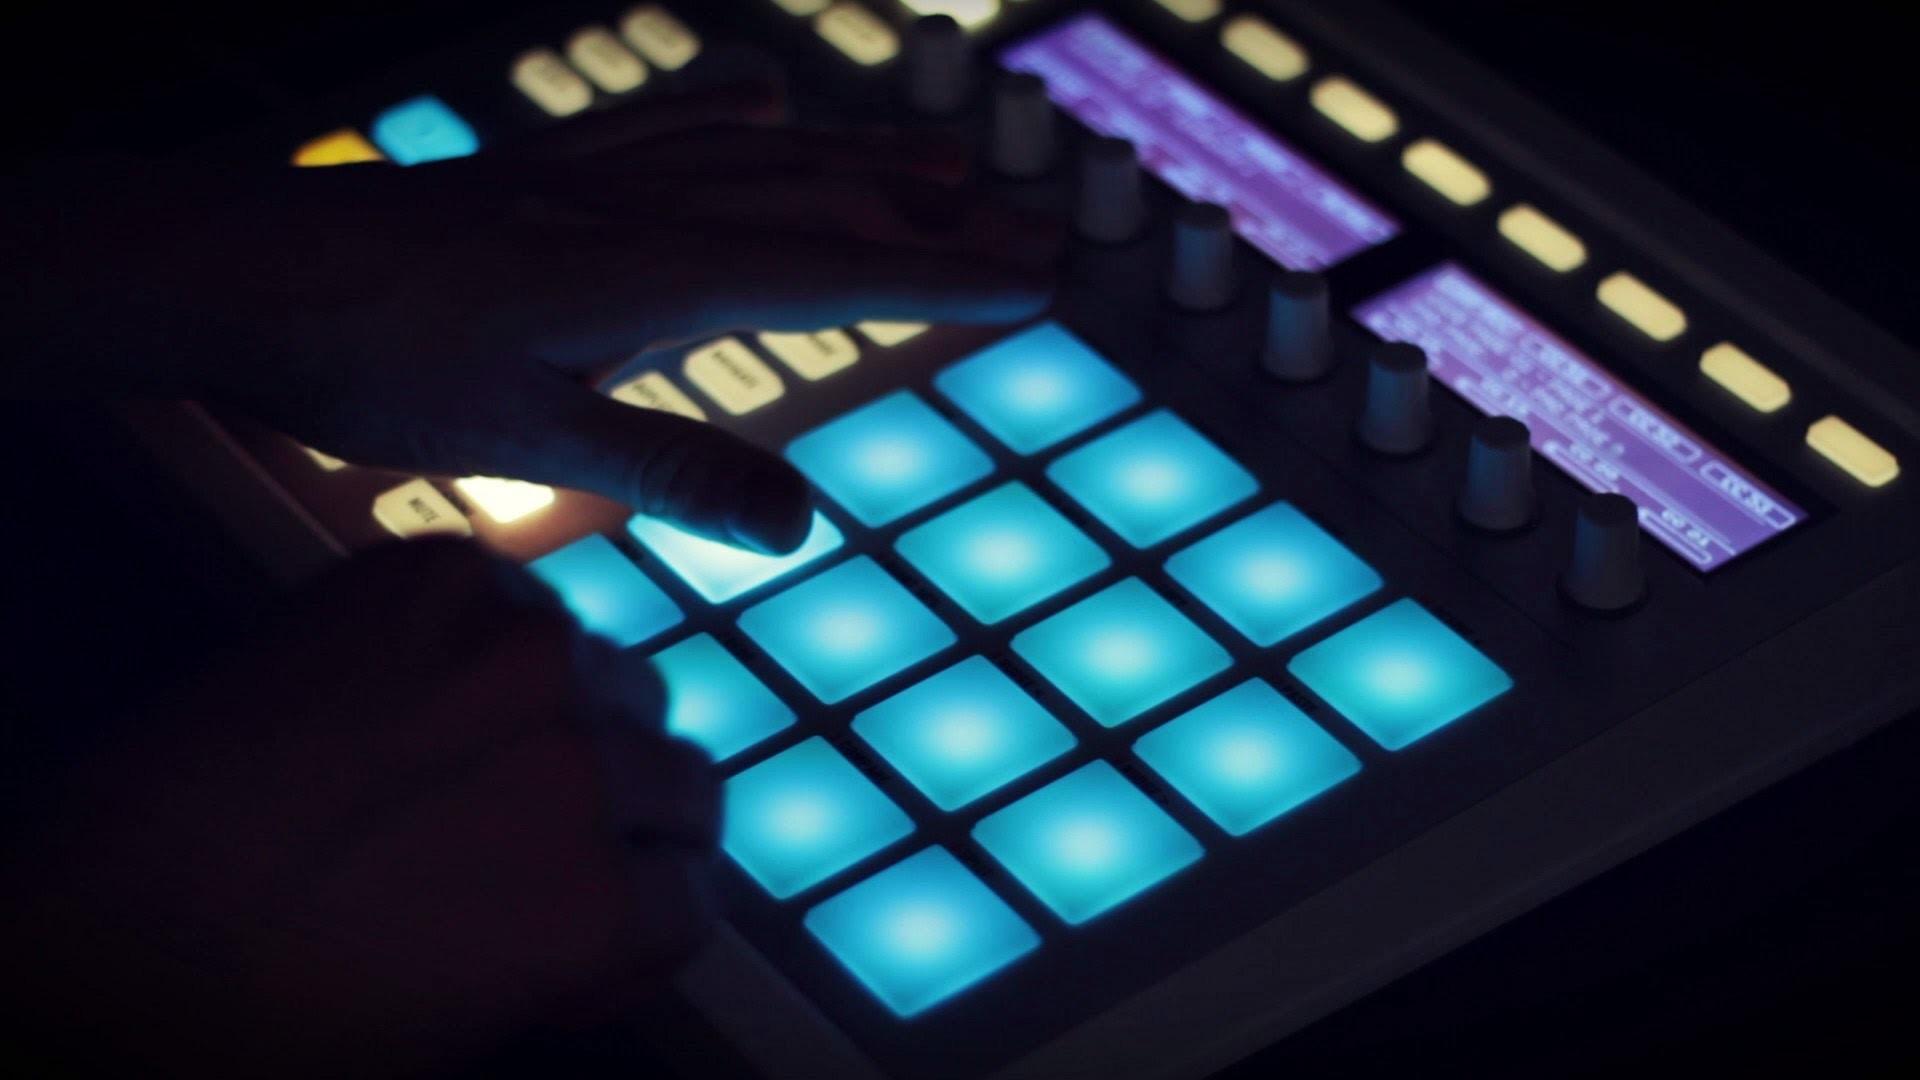 Maschine and FL Studio – Making a sampled beat